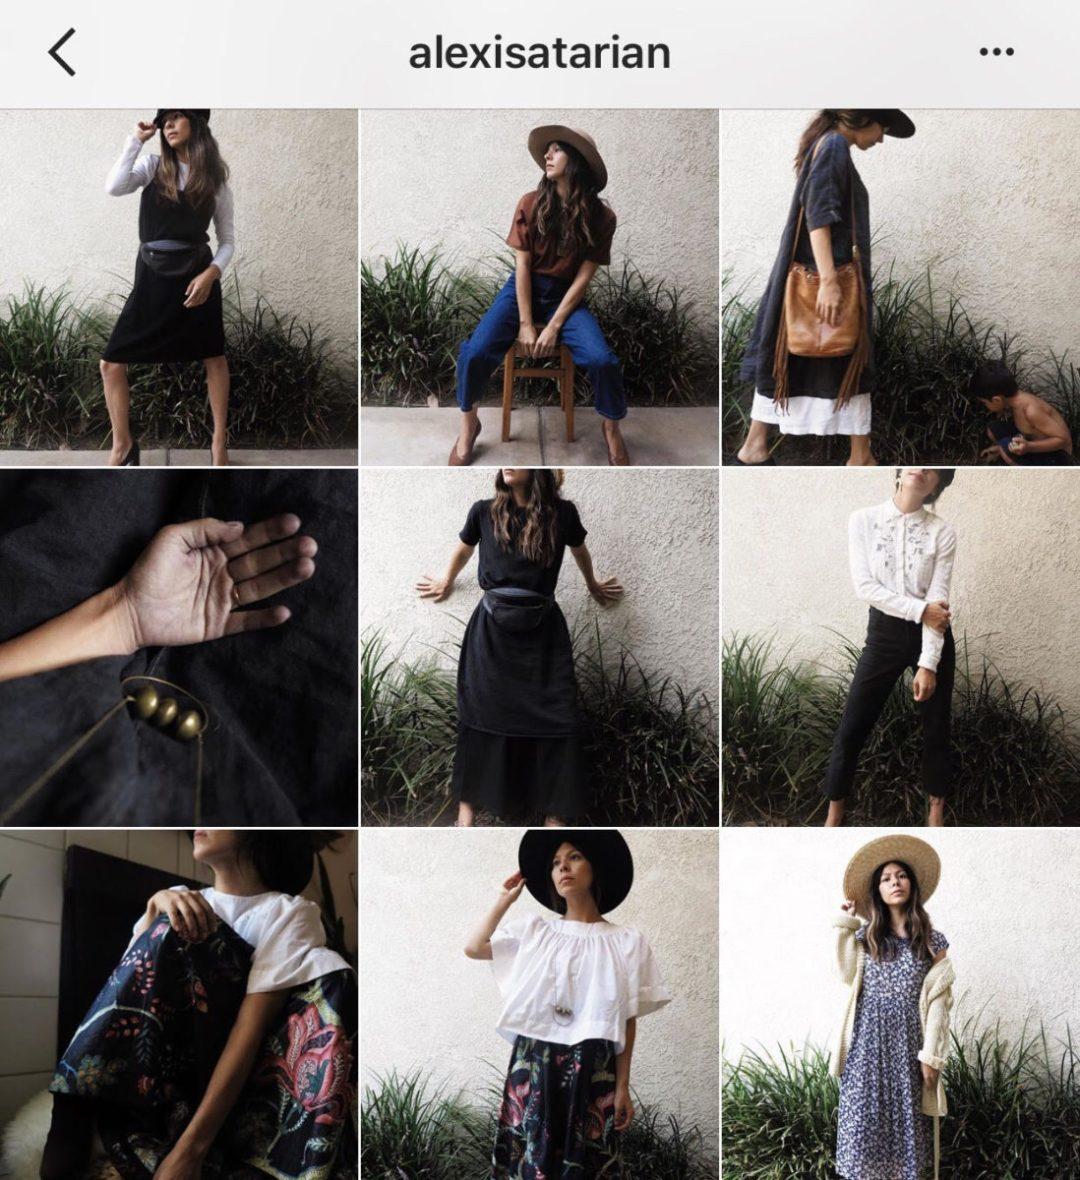 alexisatarian instagram